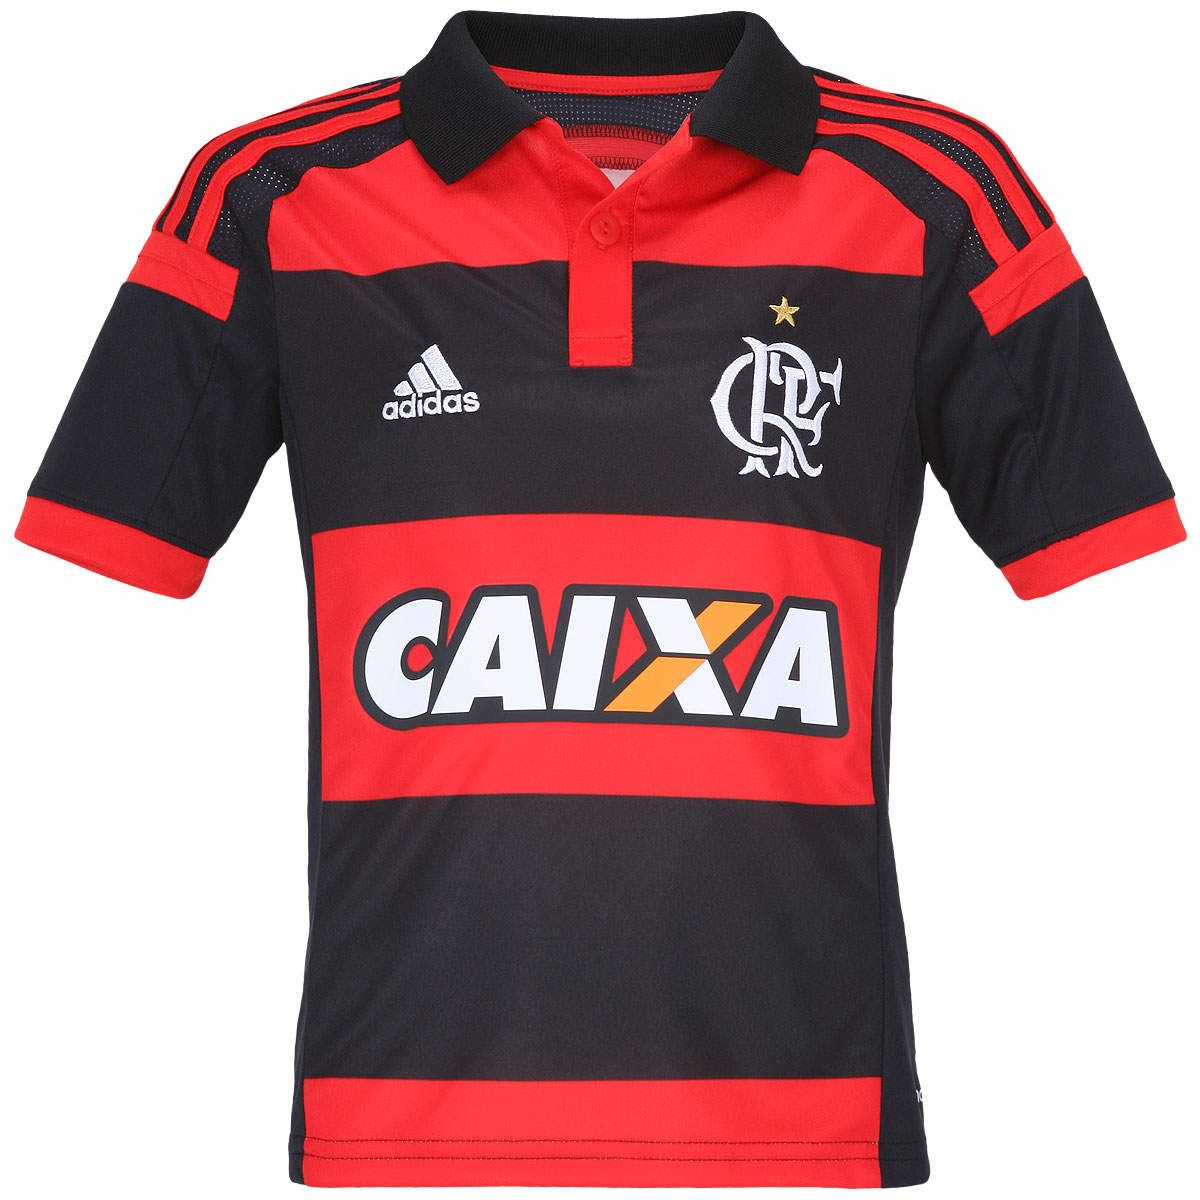 Camisa adidas Flamengo I 2014 - Infantil  96dfd7edfe832